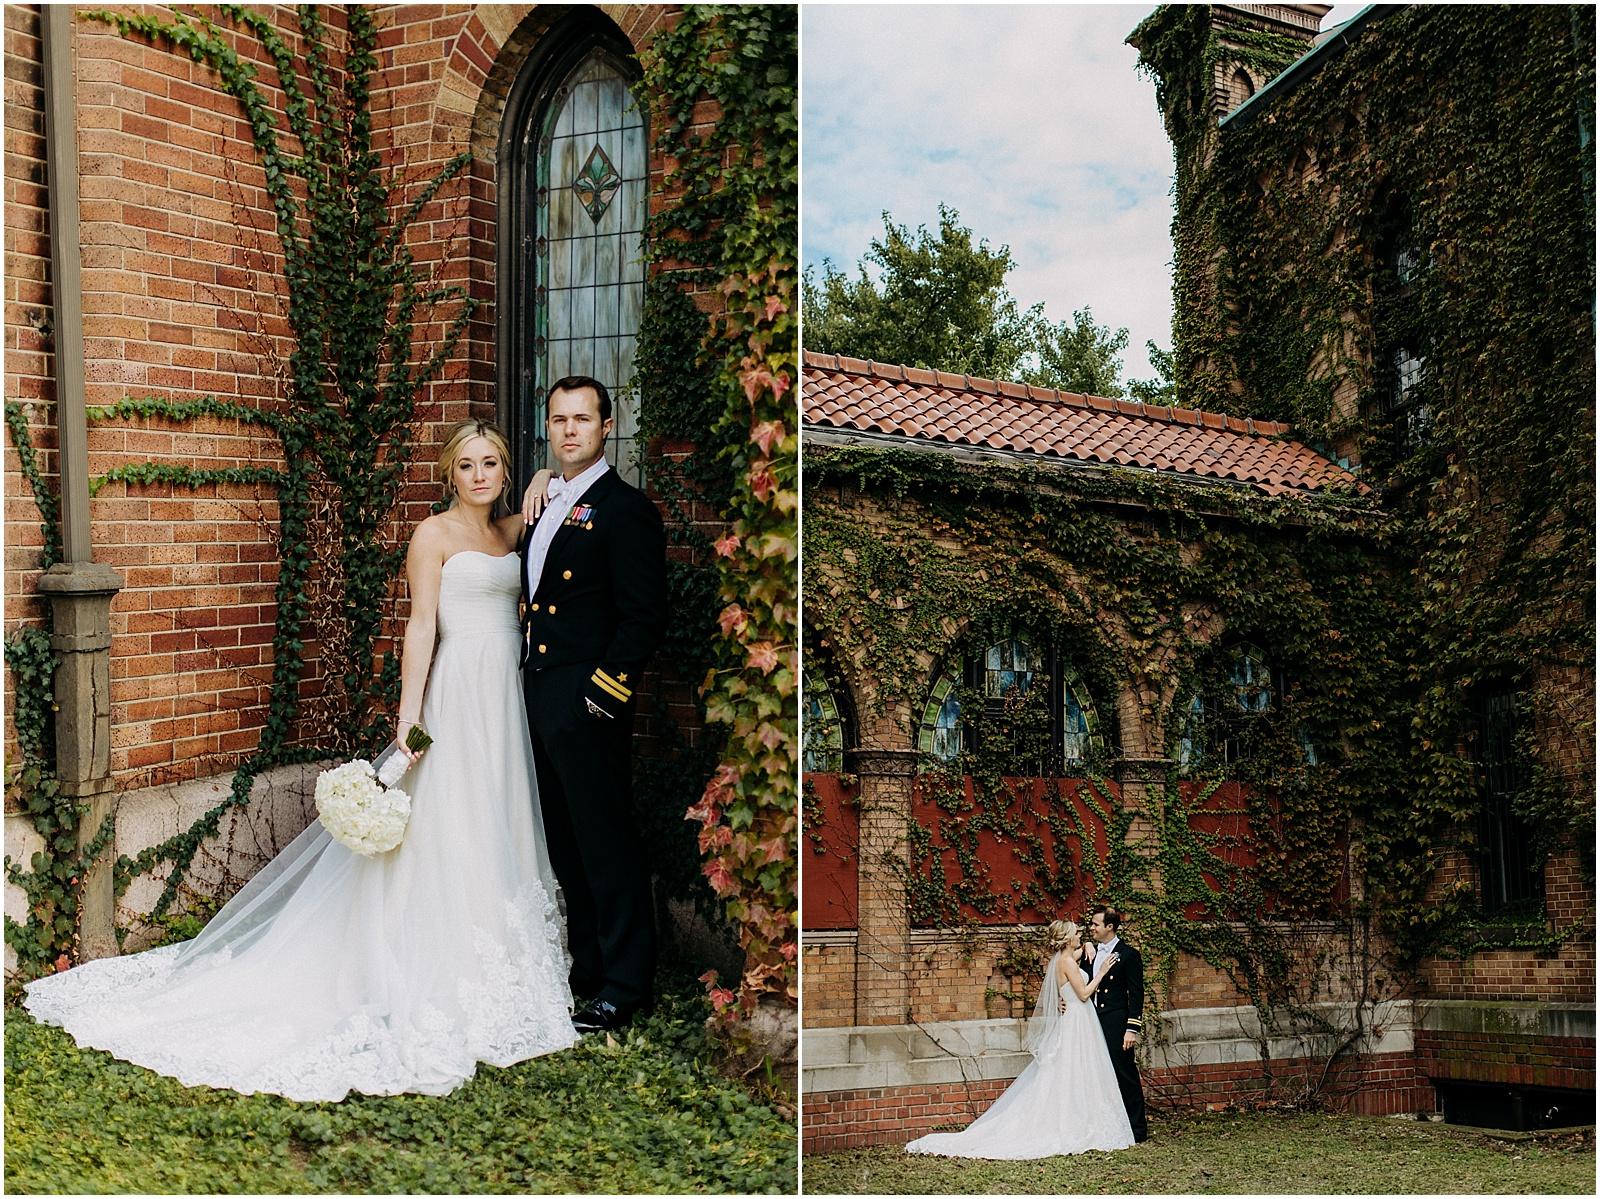 glen_echo_st_louis_mo_wedding_0061.jpg